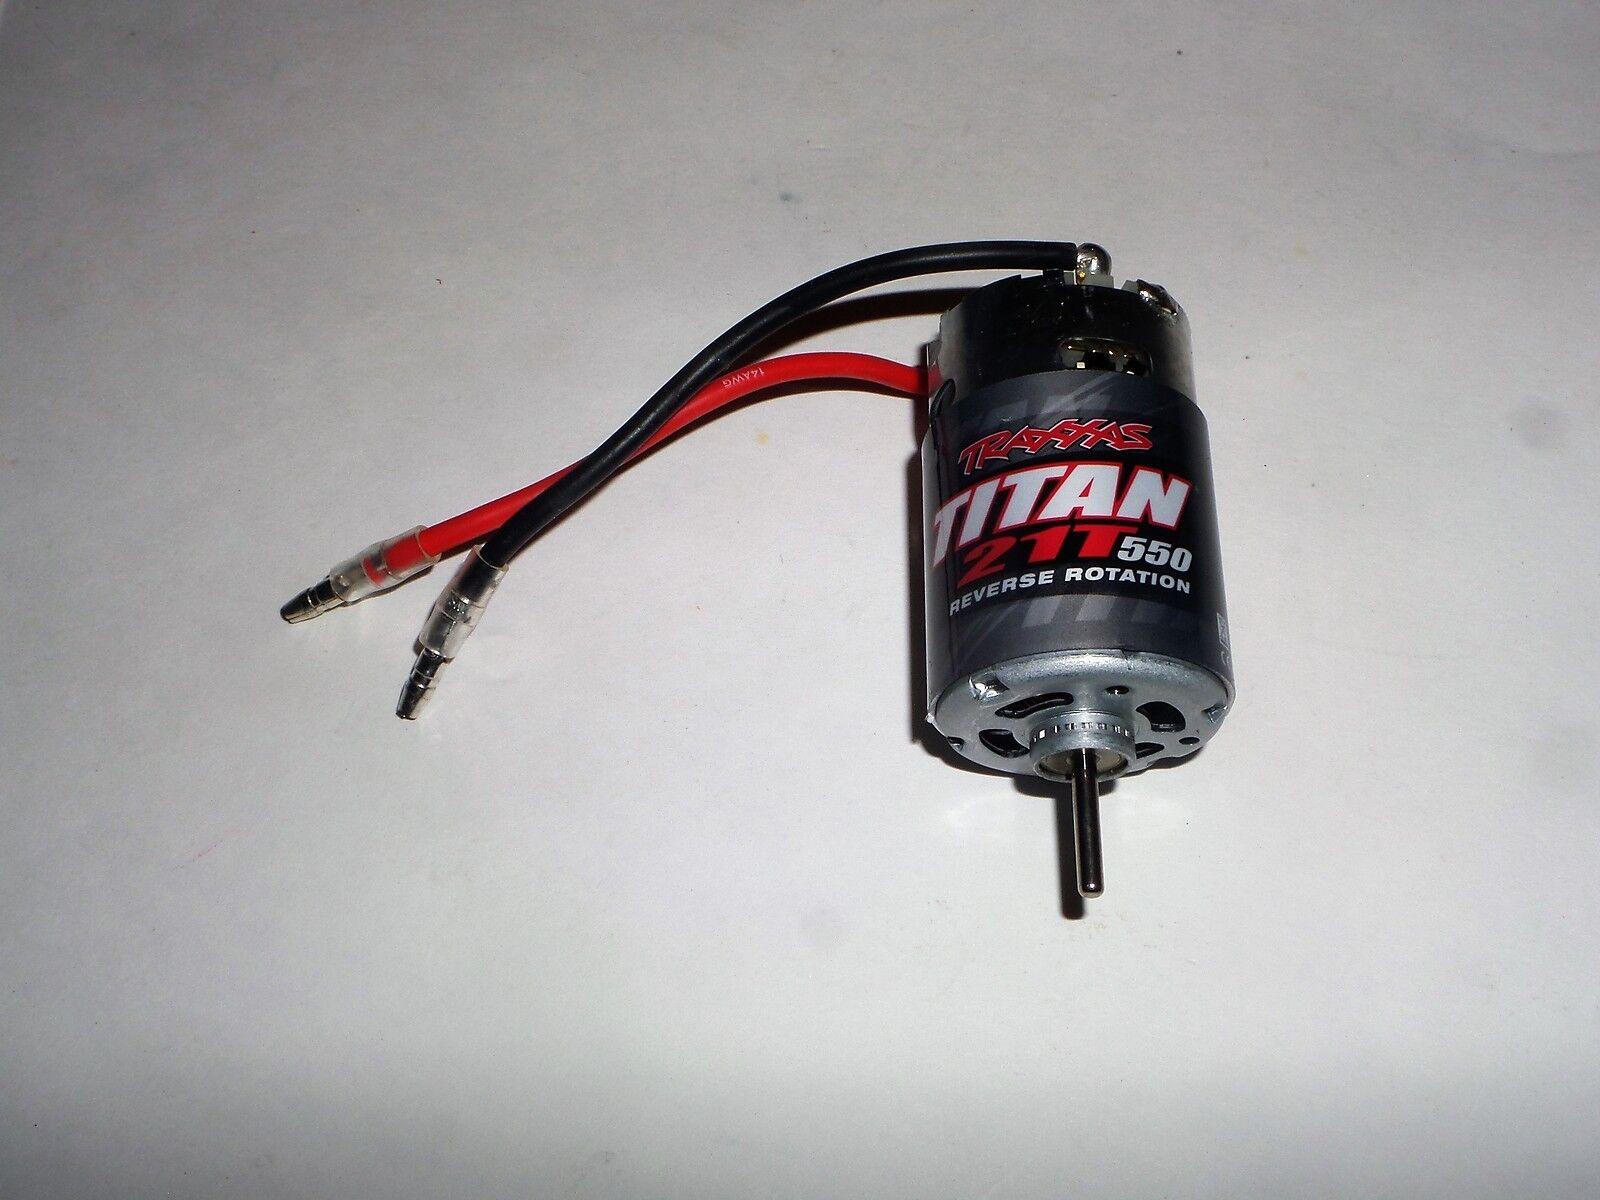 TRAXXAS TRX4 Tactical Crawler Motor 21T 550 Reverse redation